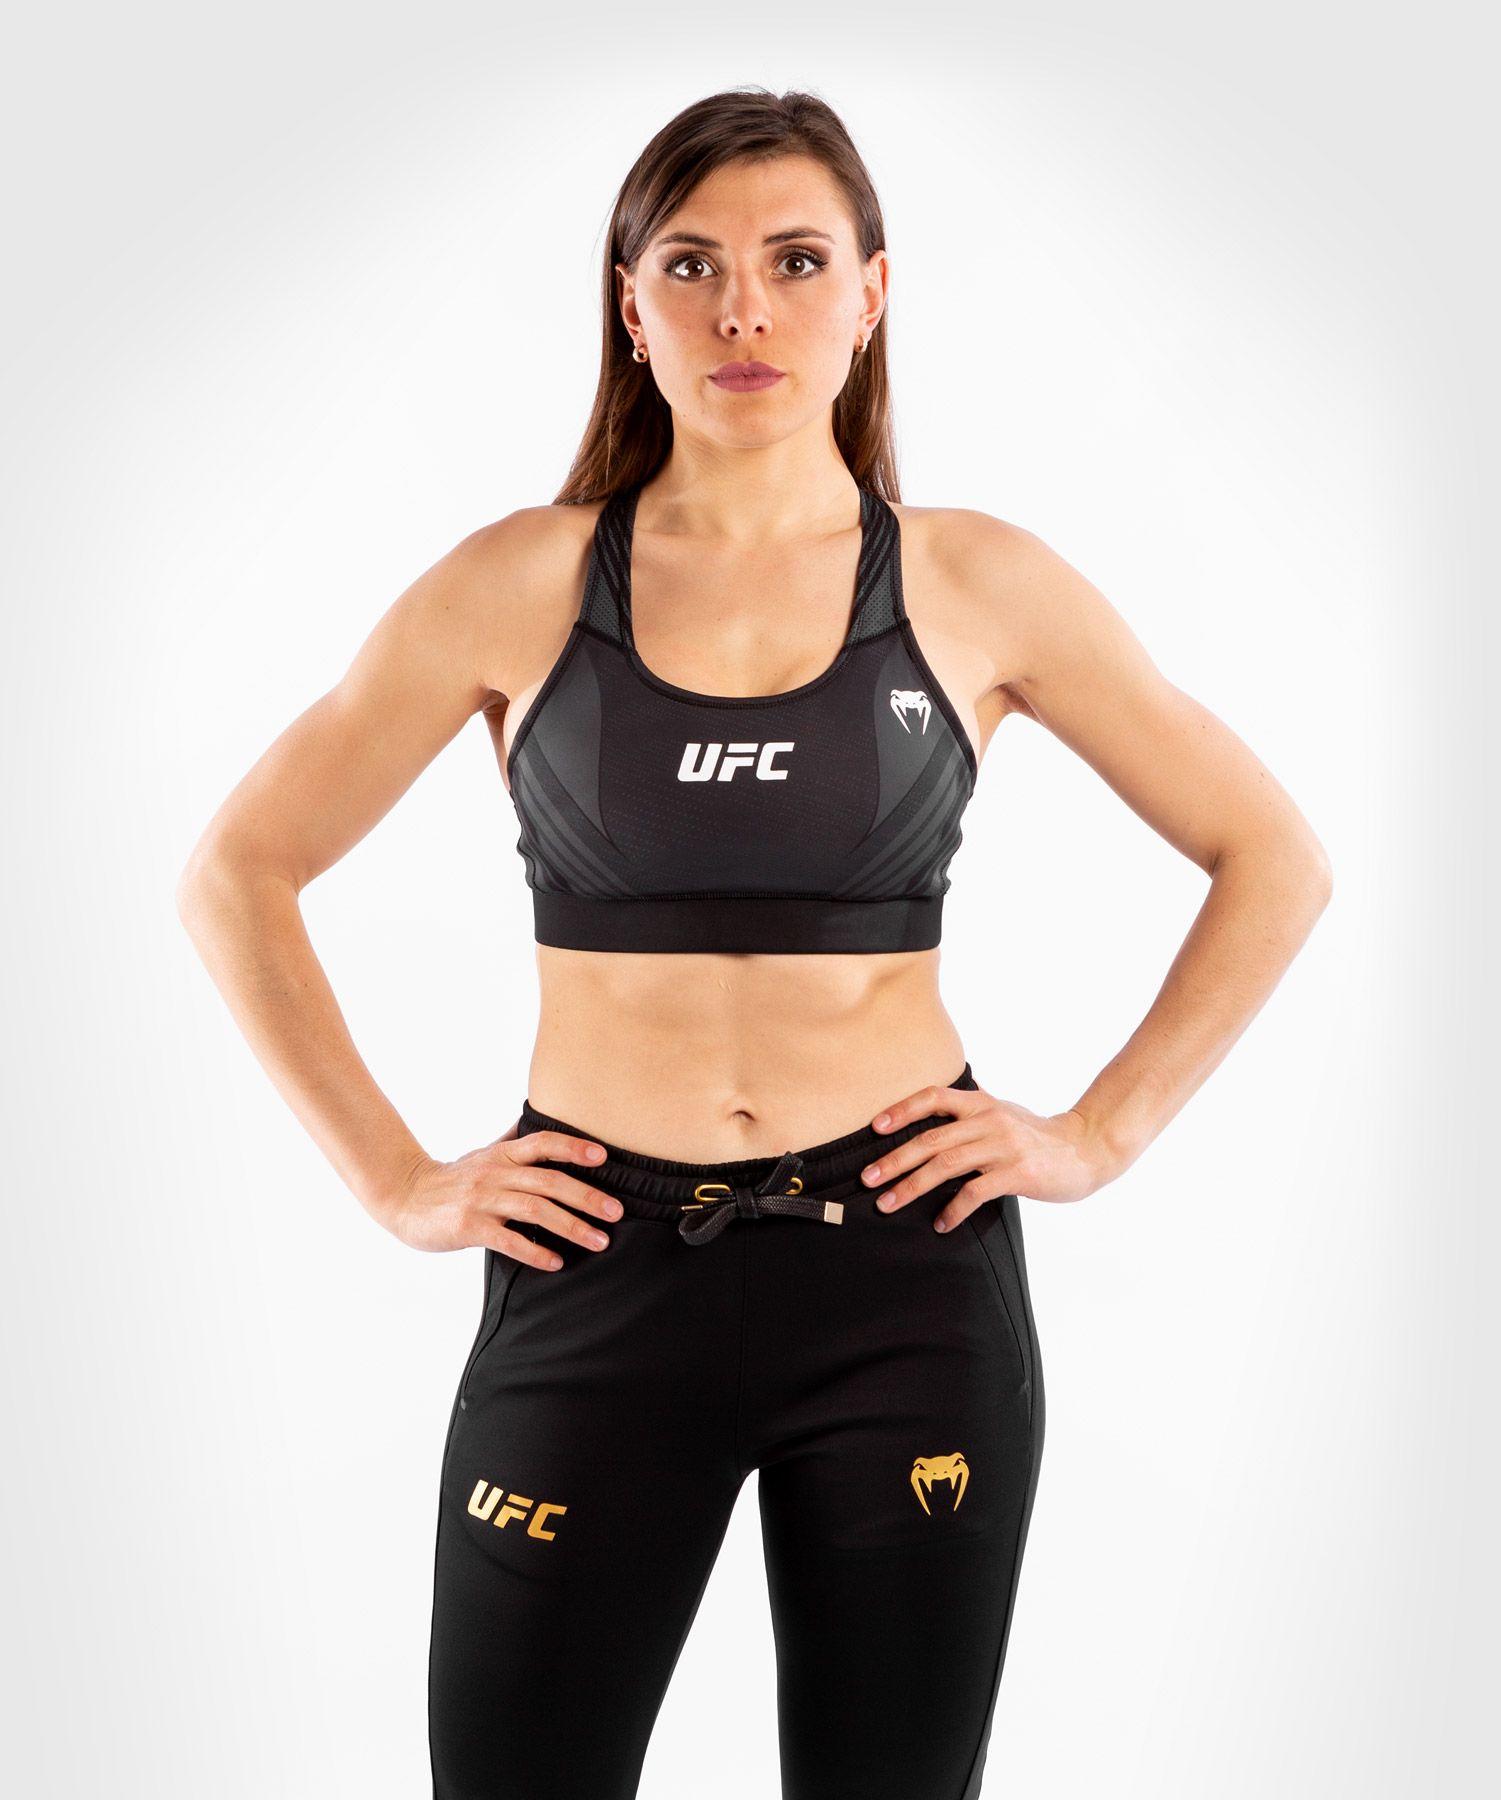 UFC Venum Authentic Fight Night Women's Sport Bra - Black